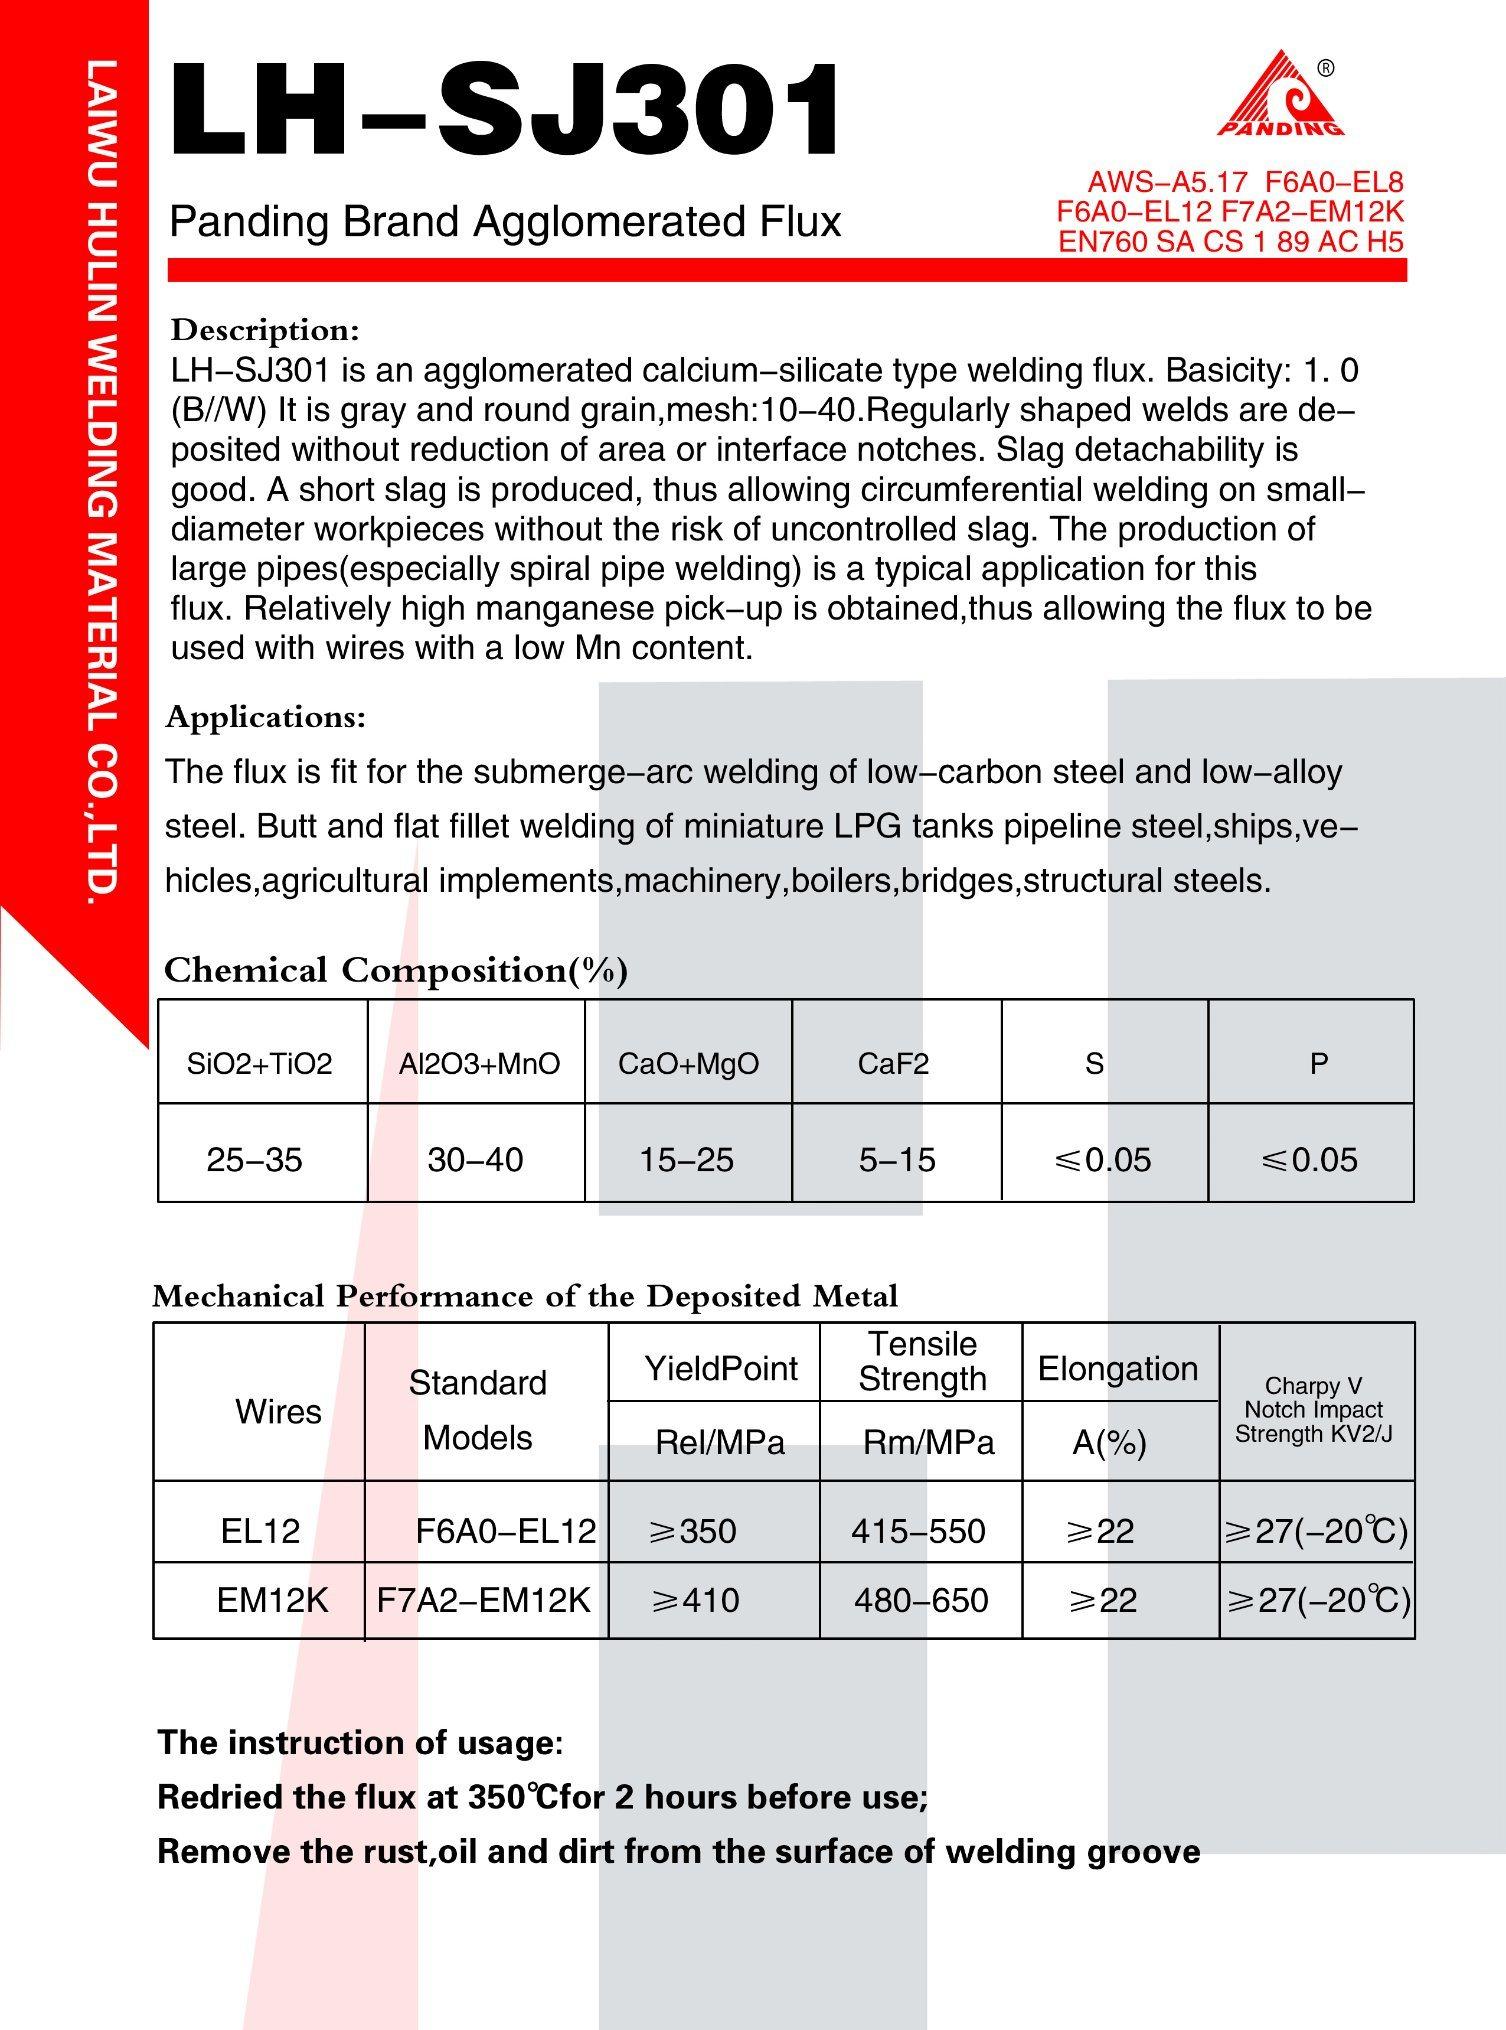 China Aluminate-Basic Saw Welding Flux/ En 760: SA Ab 1 66 AC H5 ...